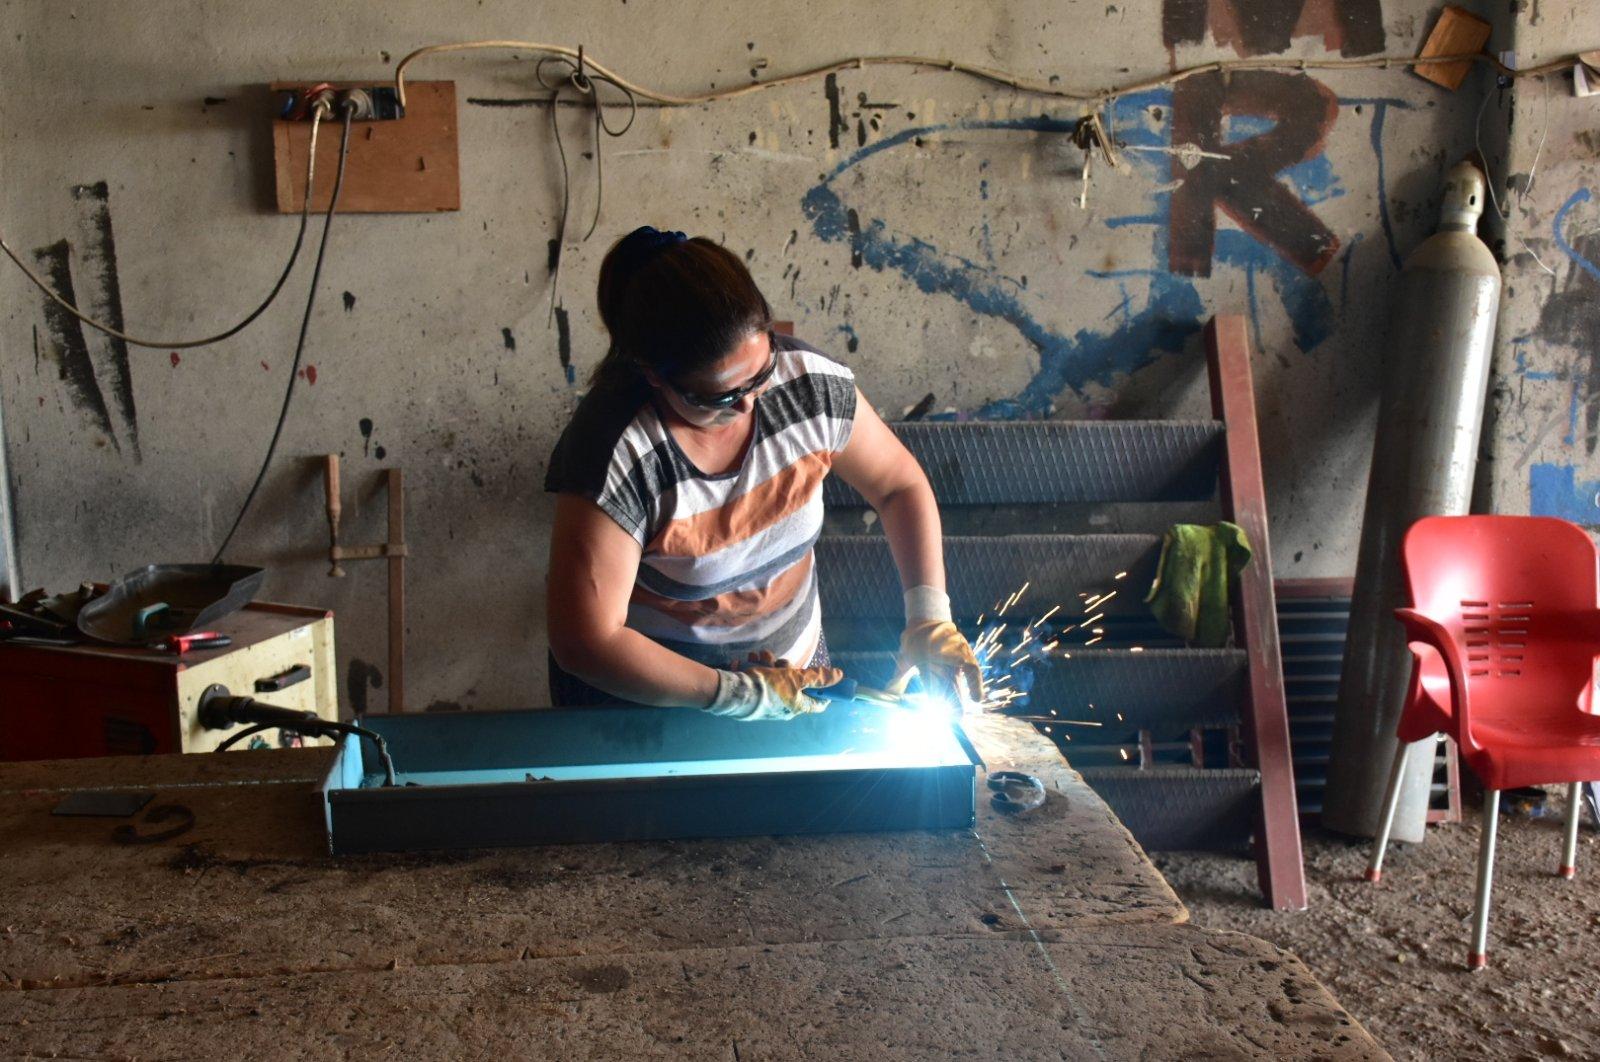 Welder Hayriye Arslan is seen in her workshop in Adana, southern Turkey, May 20, 2021. (DHA Photo)